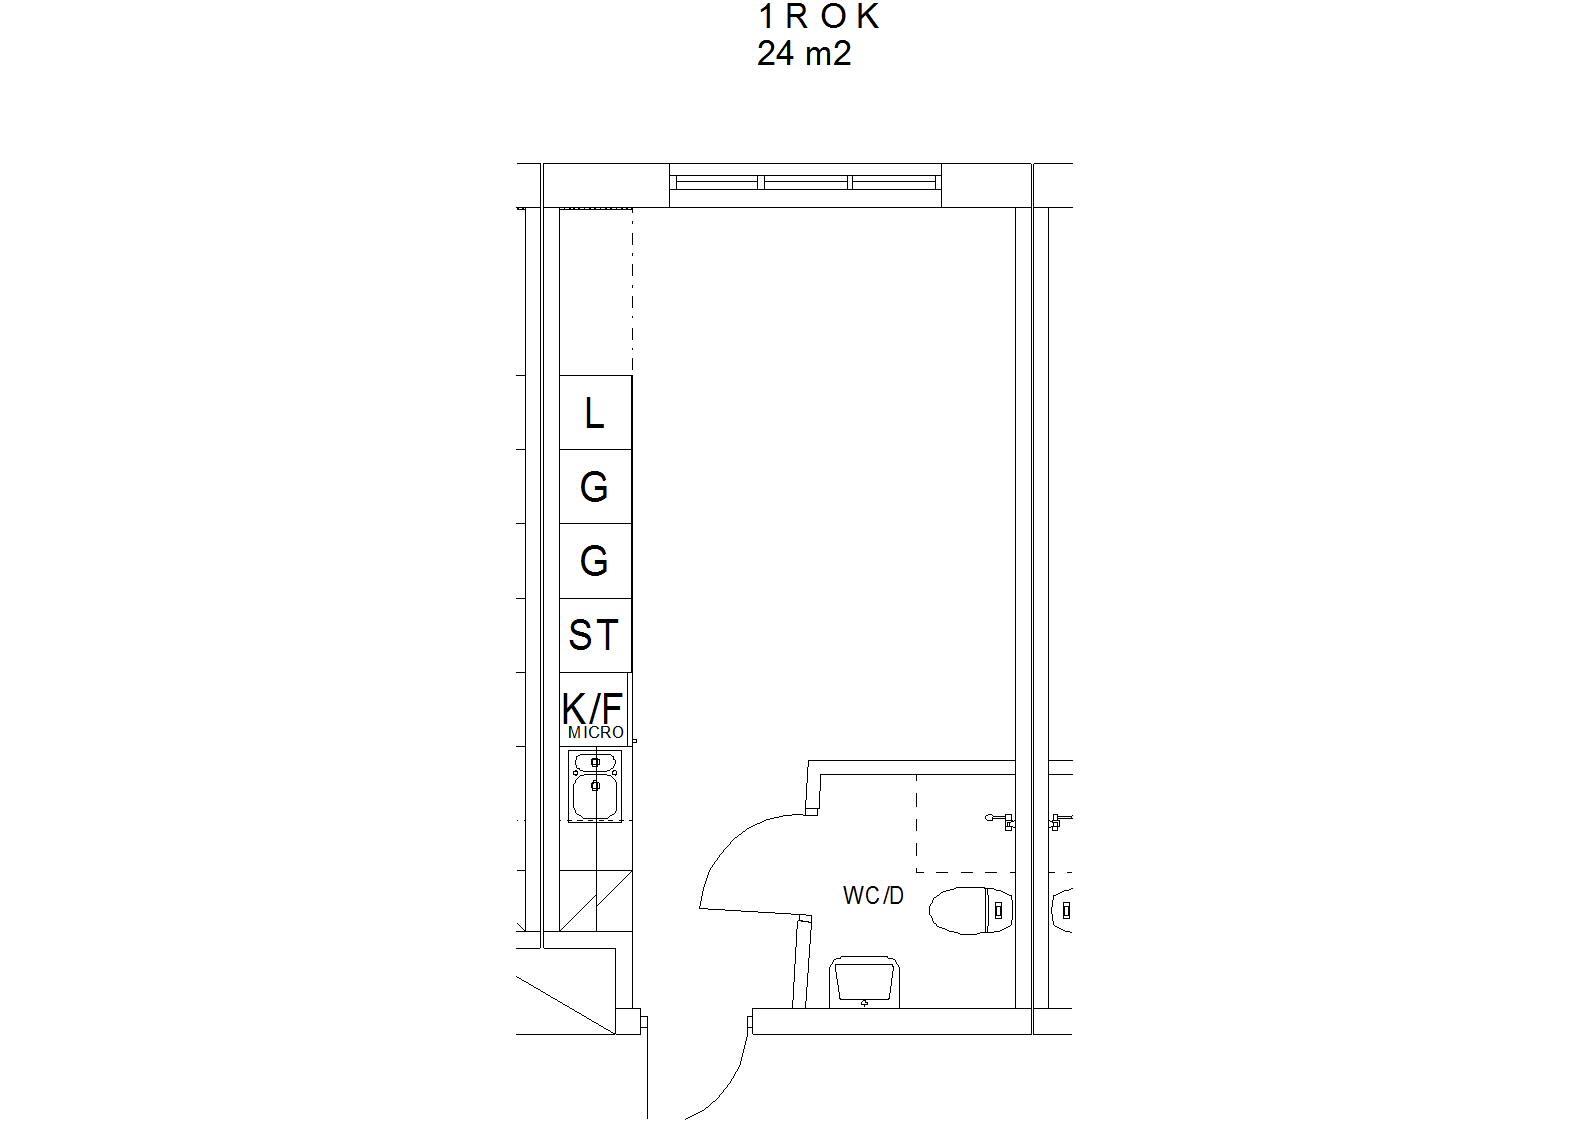 Planlosning Litet Kok : litet kok planlosning  Moblerad 1 a 24mo Pris 4588 4635kr mon